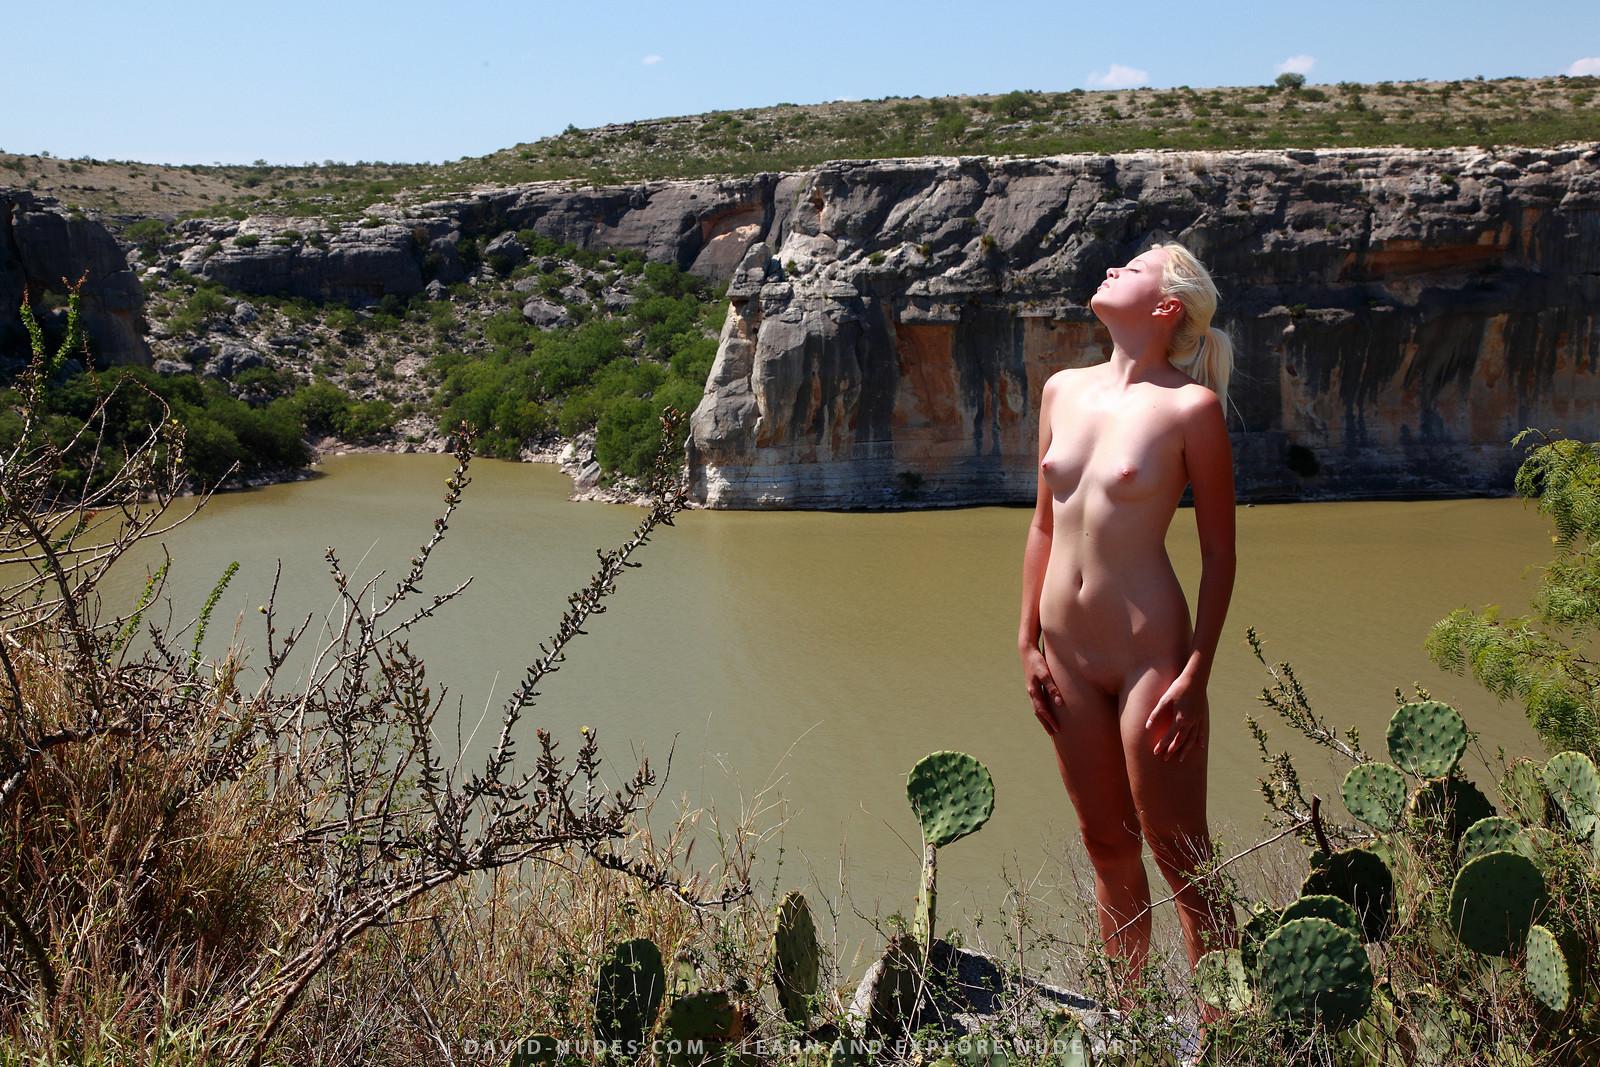 Single Grande Prairie Men Seeking Anal Sex Buddies Interested In Anal Sex Dating, Anal Sex Buddy